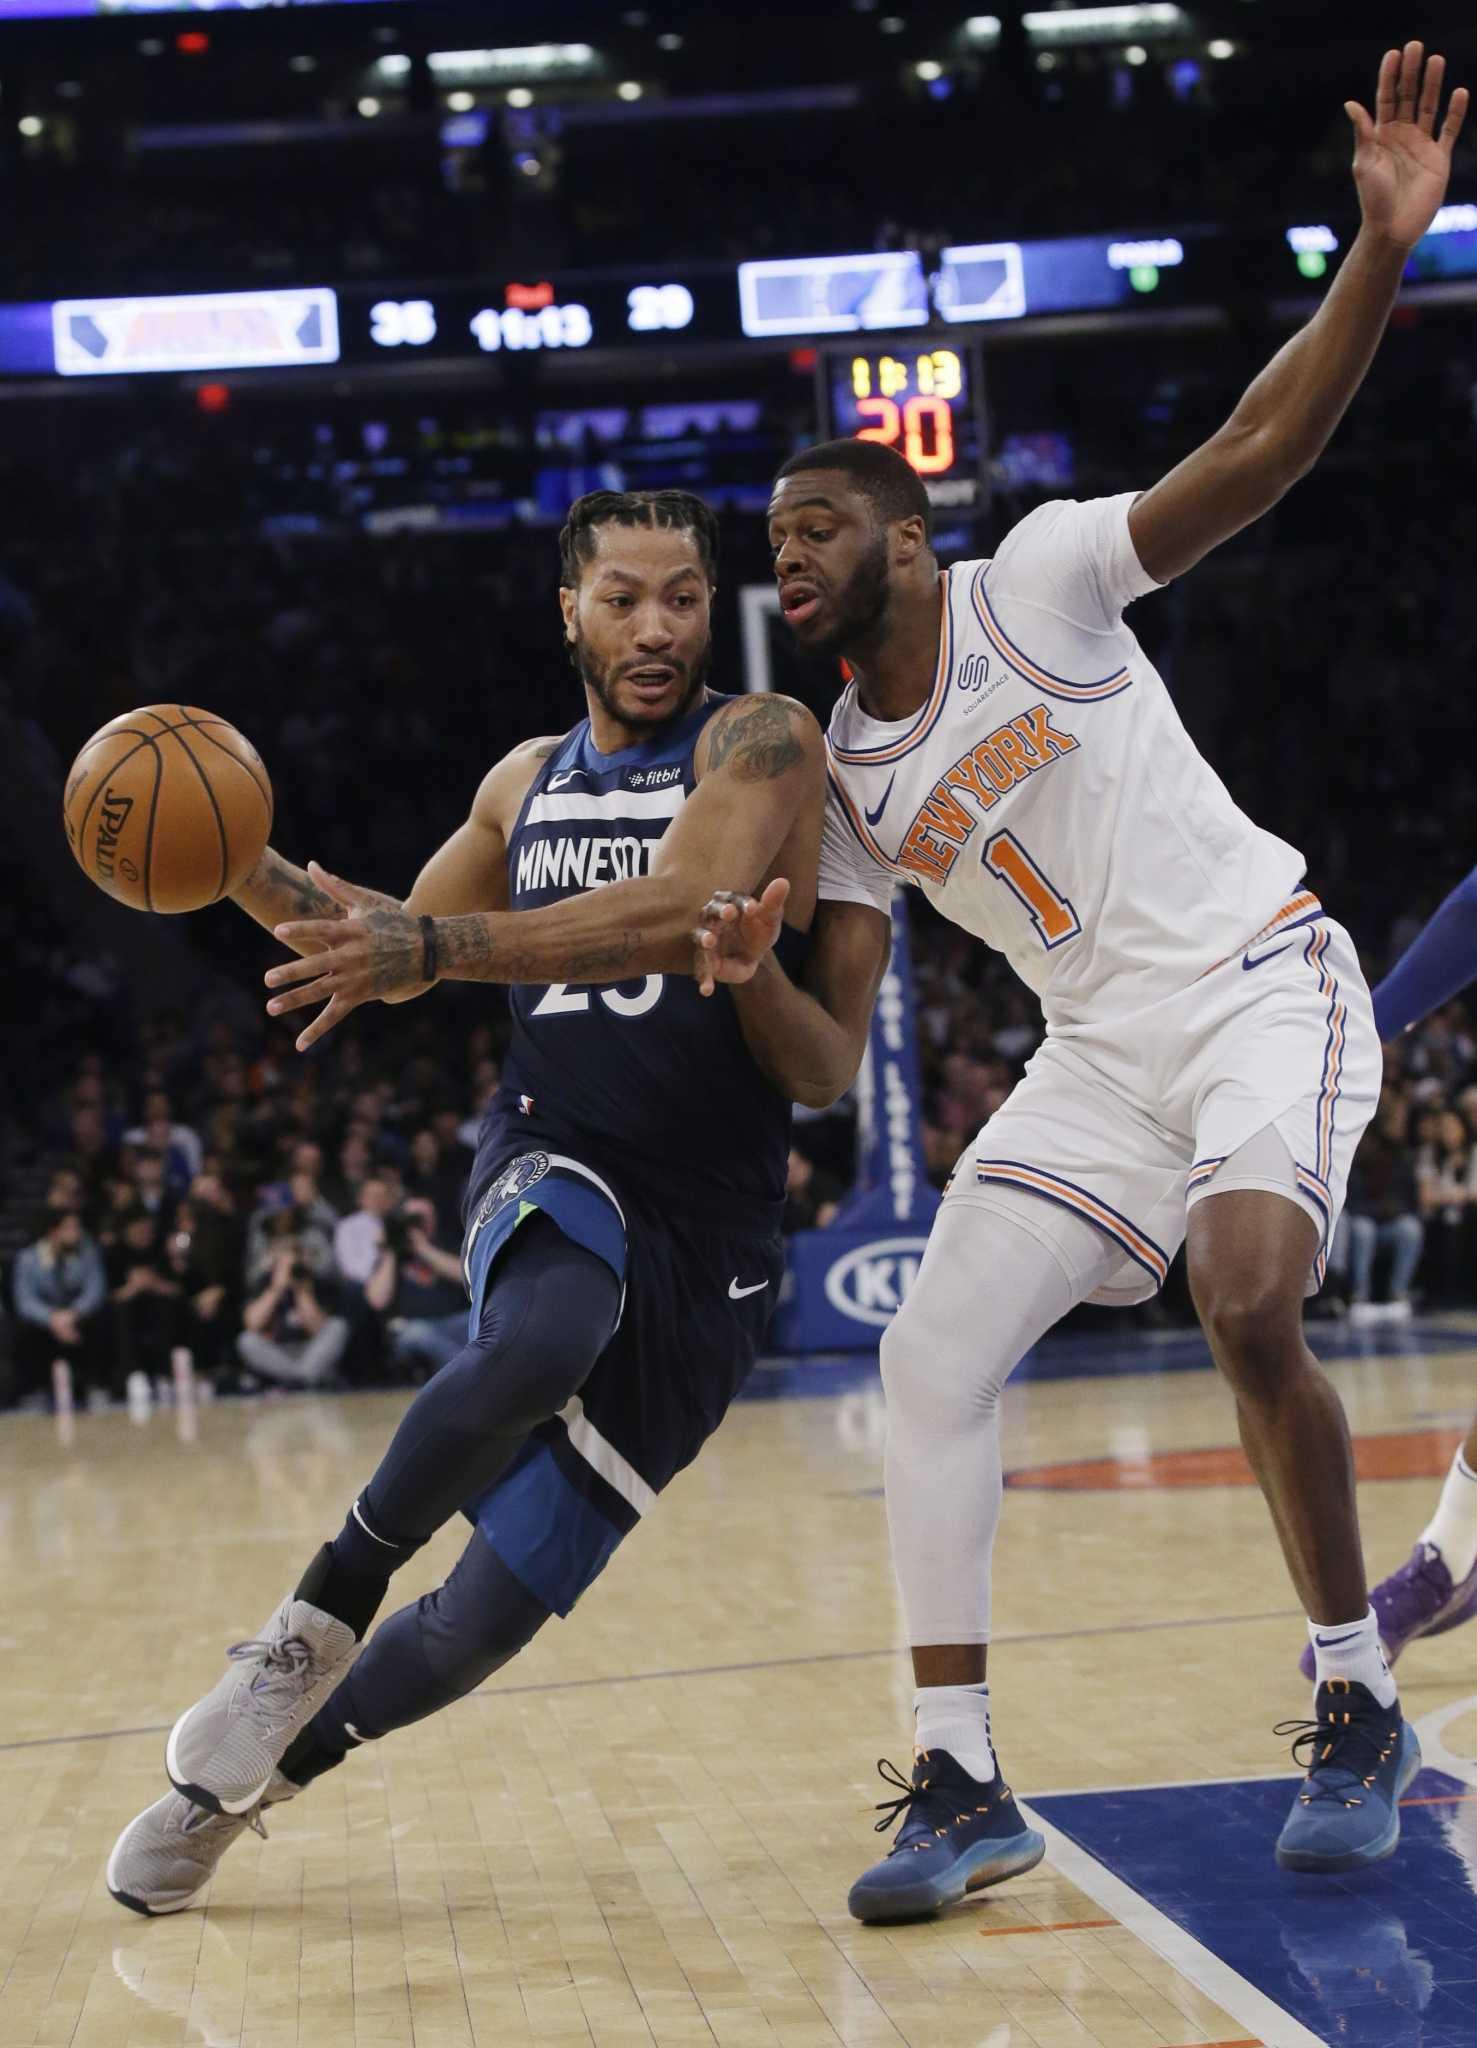 749ef8a9e9c5 Knicks lose at home again - Times Union